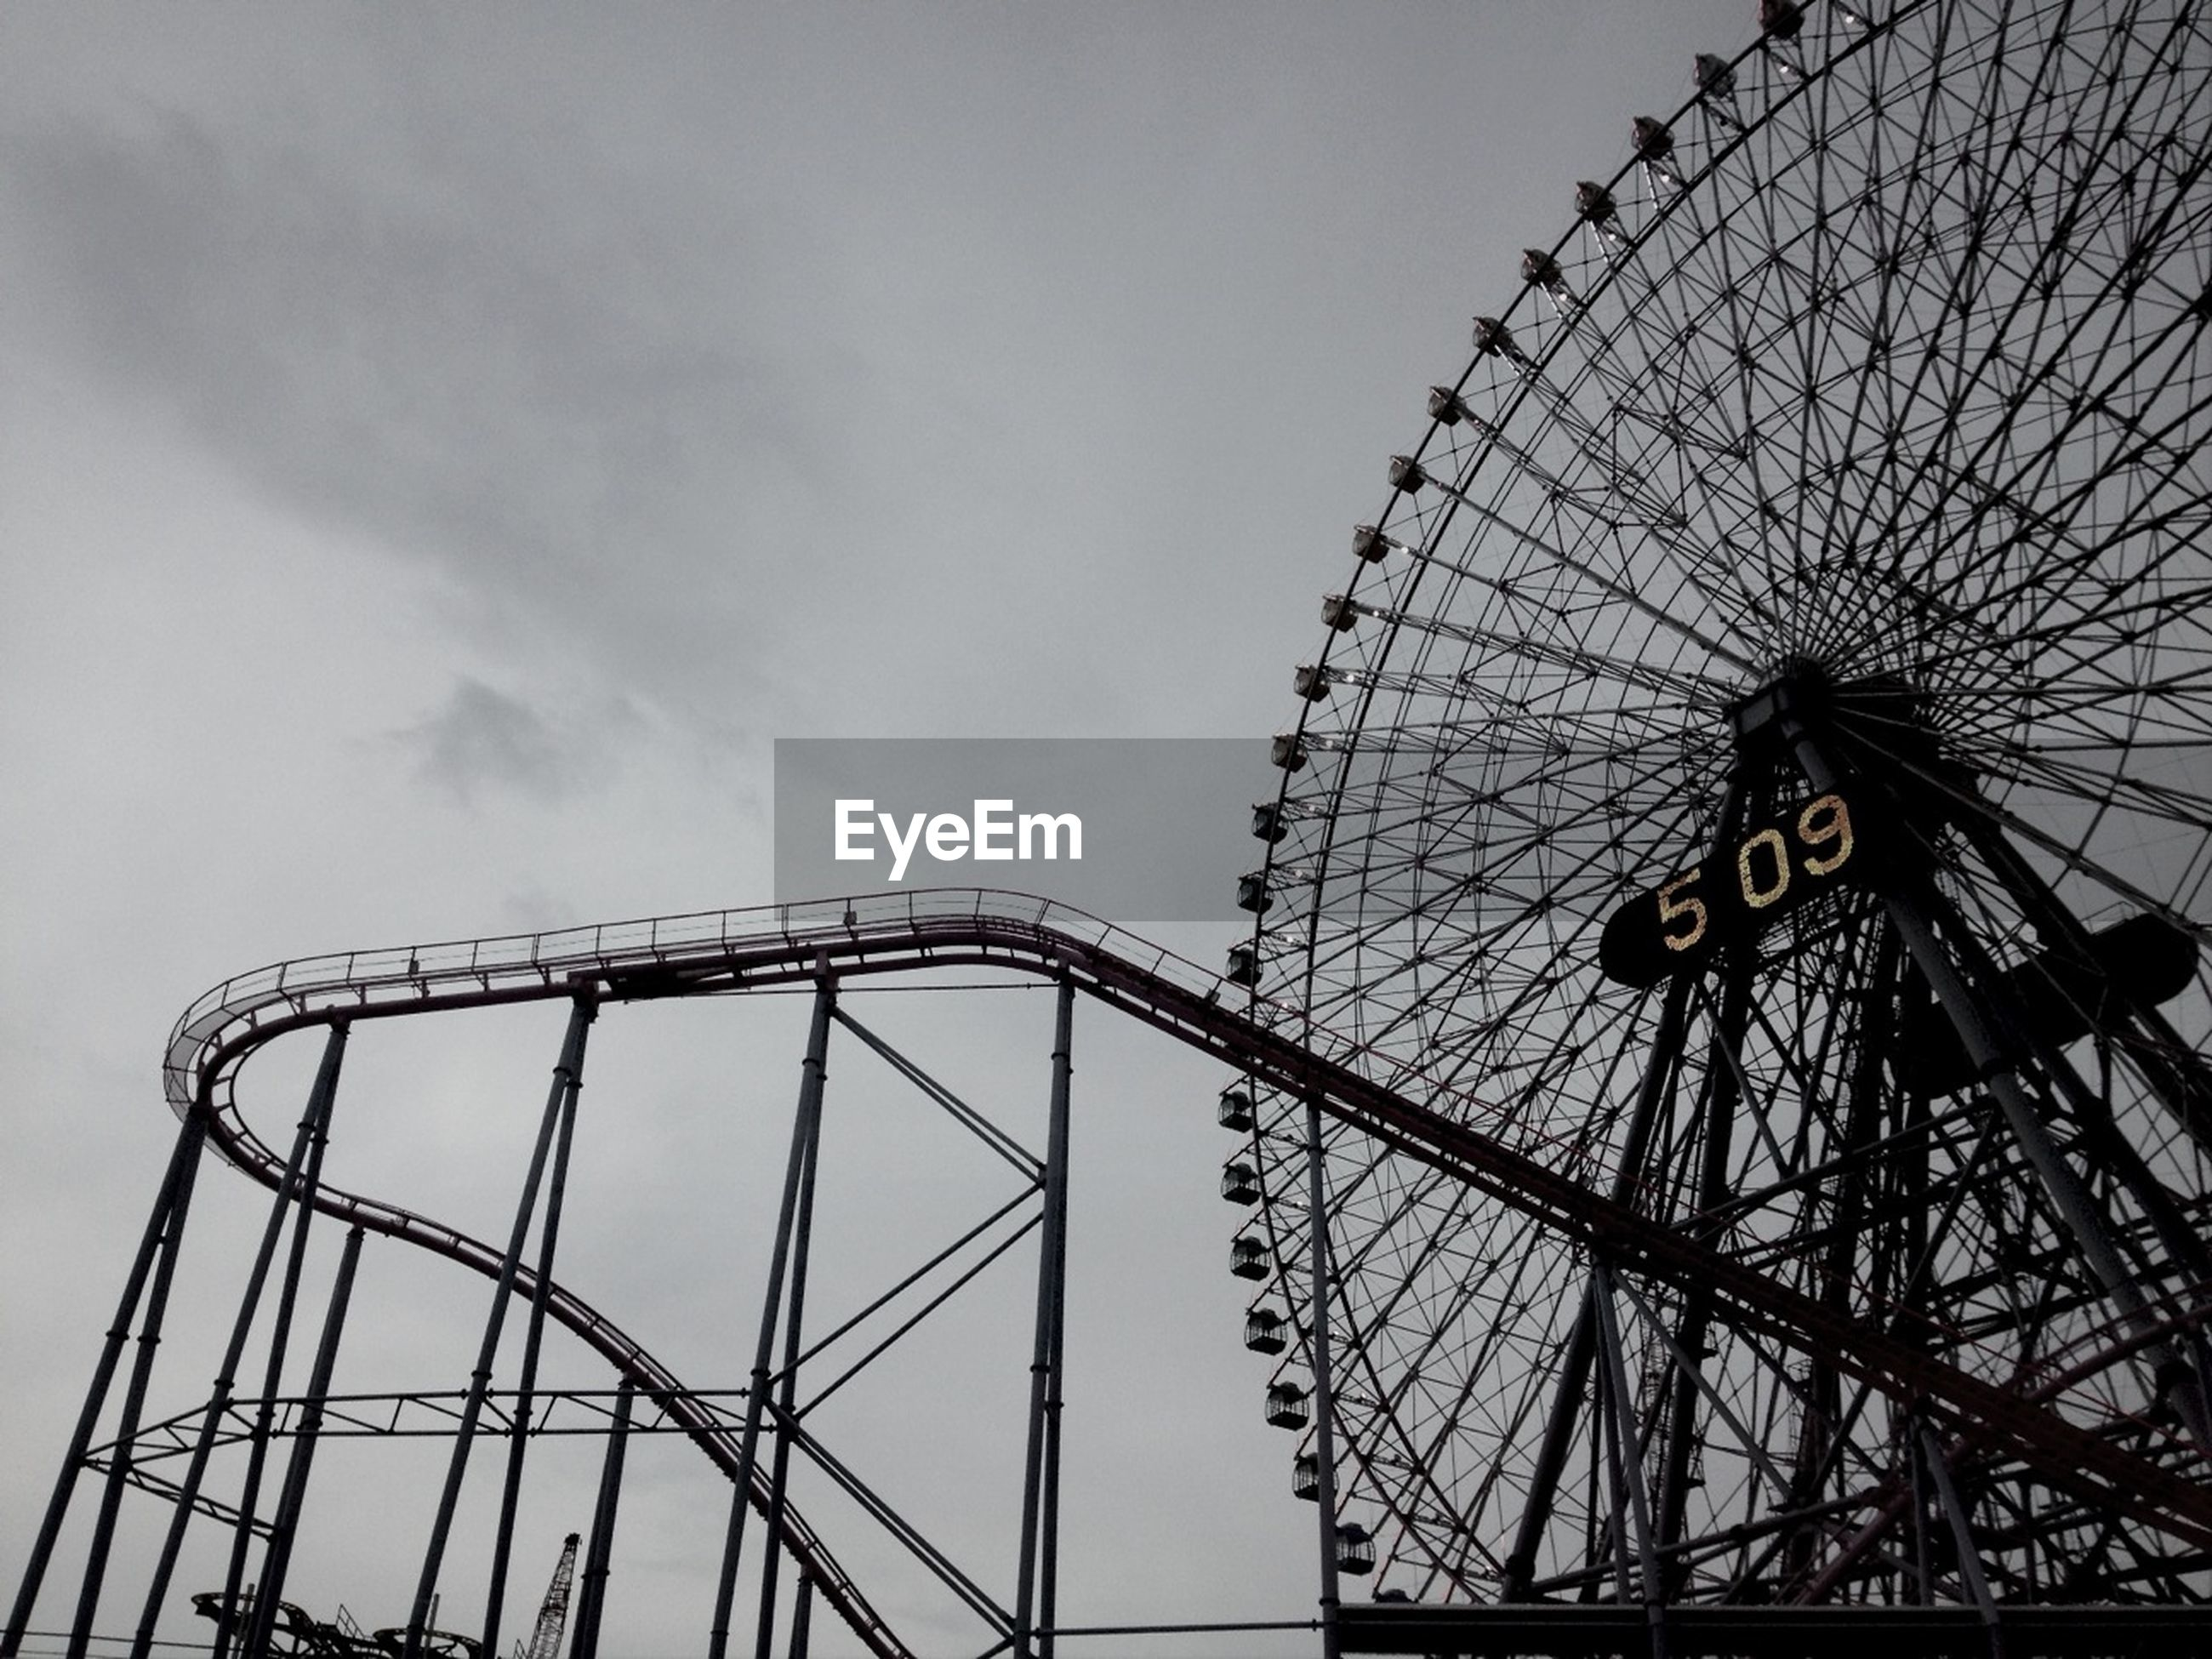 amusement park, ferris wheel, amusement park ride, low angle view, arts culture and entertainment, sky, metal, built structure, fairground, day, outdoors, big wheel, large, fun, cloud - sky, part of, no people, fairground ride, clear sky, metallic